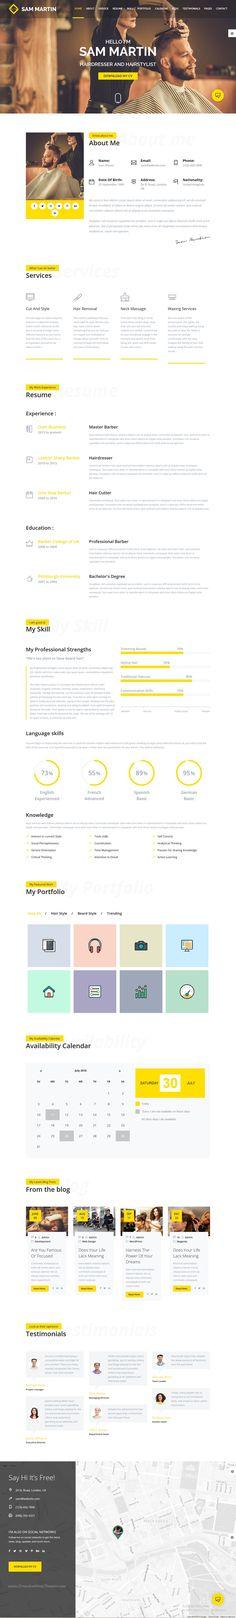 Sam Martin is an elegant, @Bootstrap HTML #portfolio template for #hairstylist #hairdresser vCard, #resume website download now➝ https://themeforest.net/item/sam-martin-personal-vcard-resume-html-template/16795240?ref=Datasata